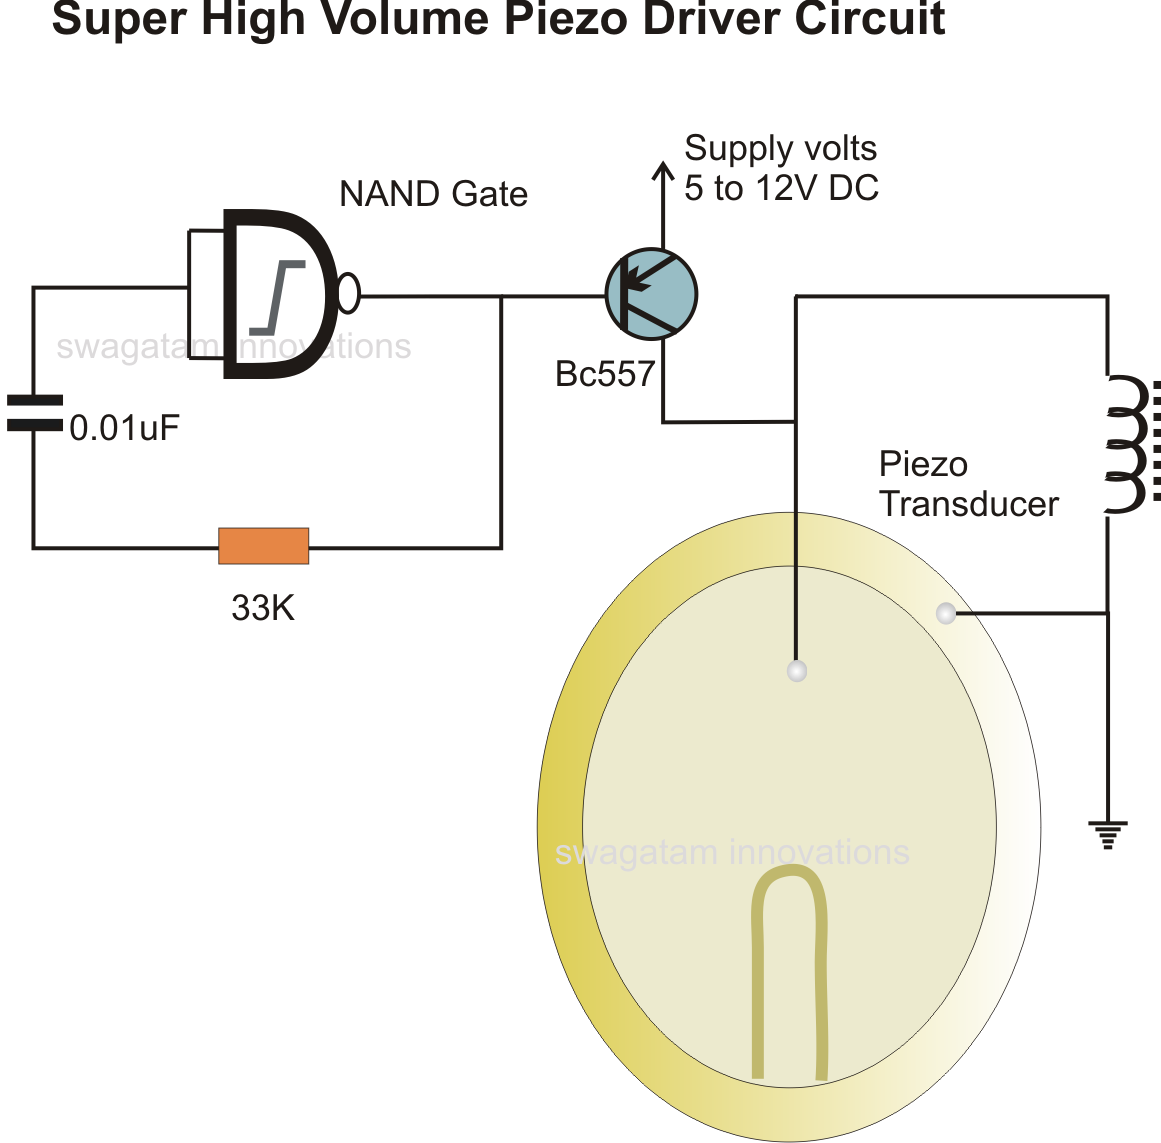 led driving light wiring diagram led motorcycle light photosensitive led light circuit diagram led circuit board diagram [ 1161 x 1143 Pixel ]